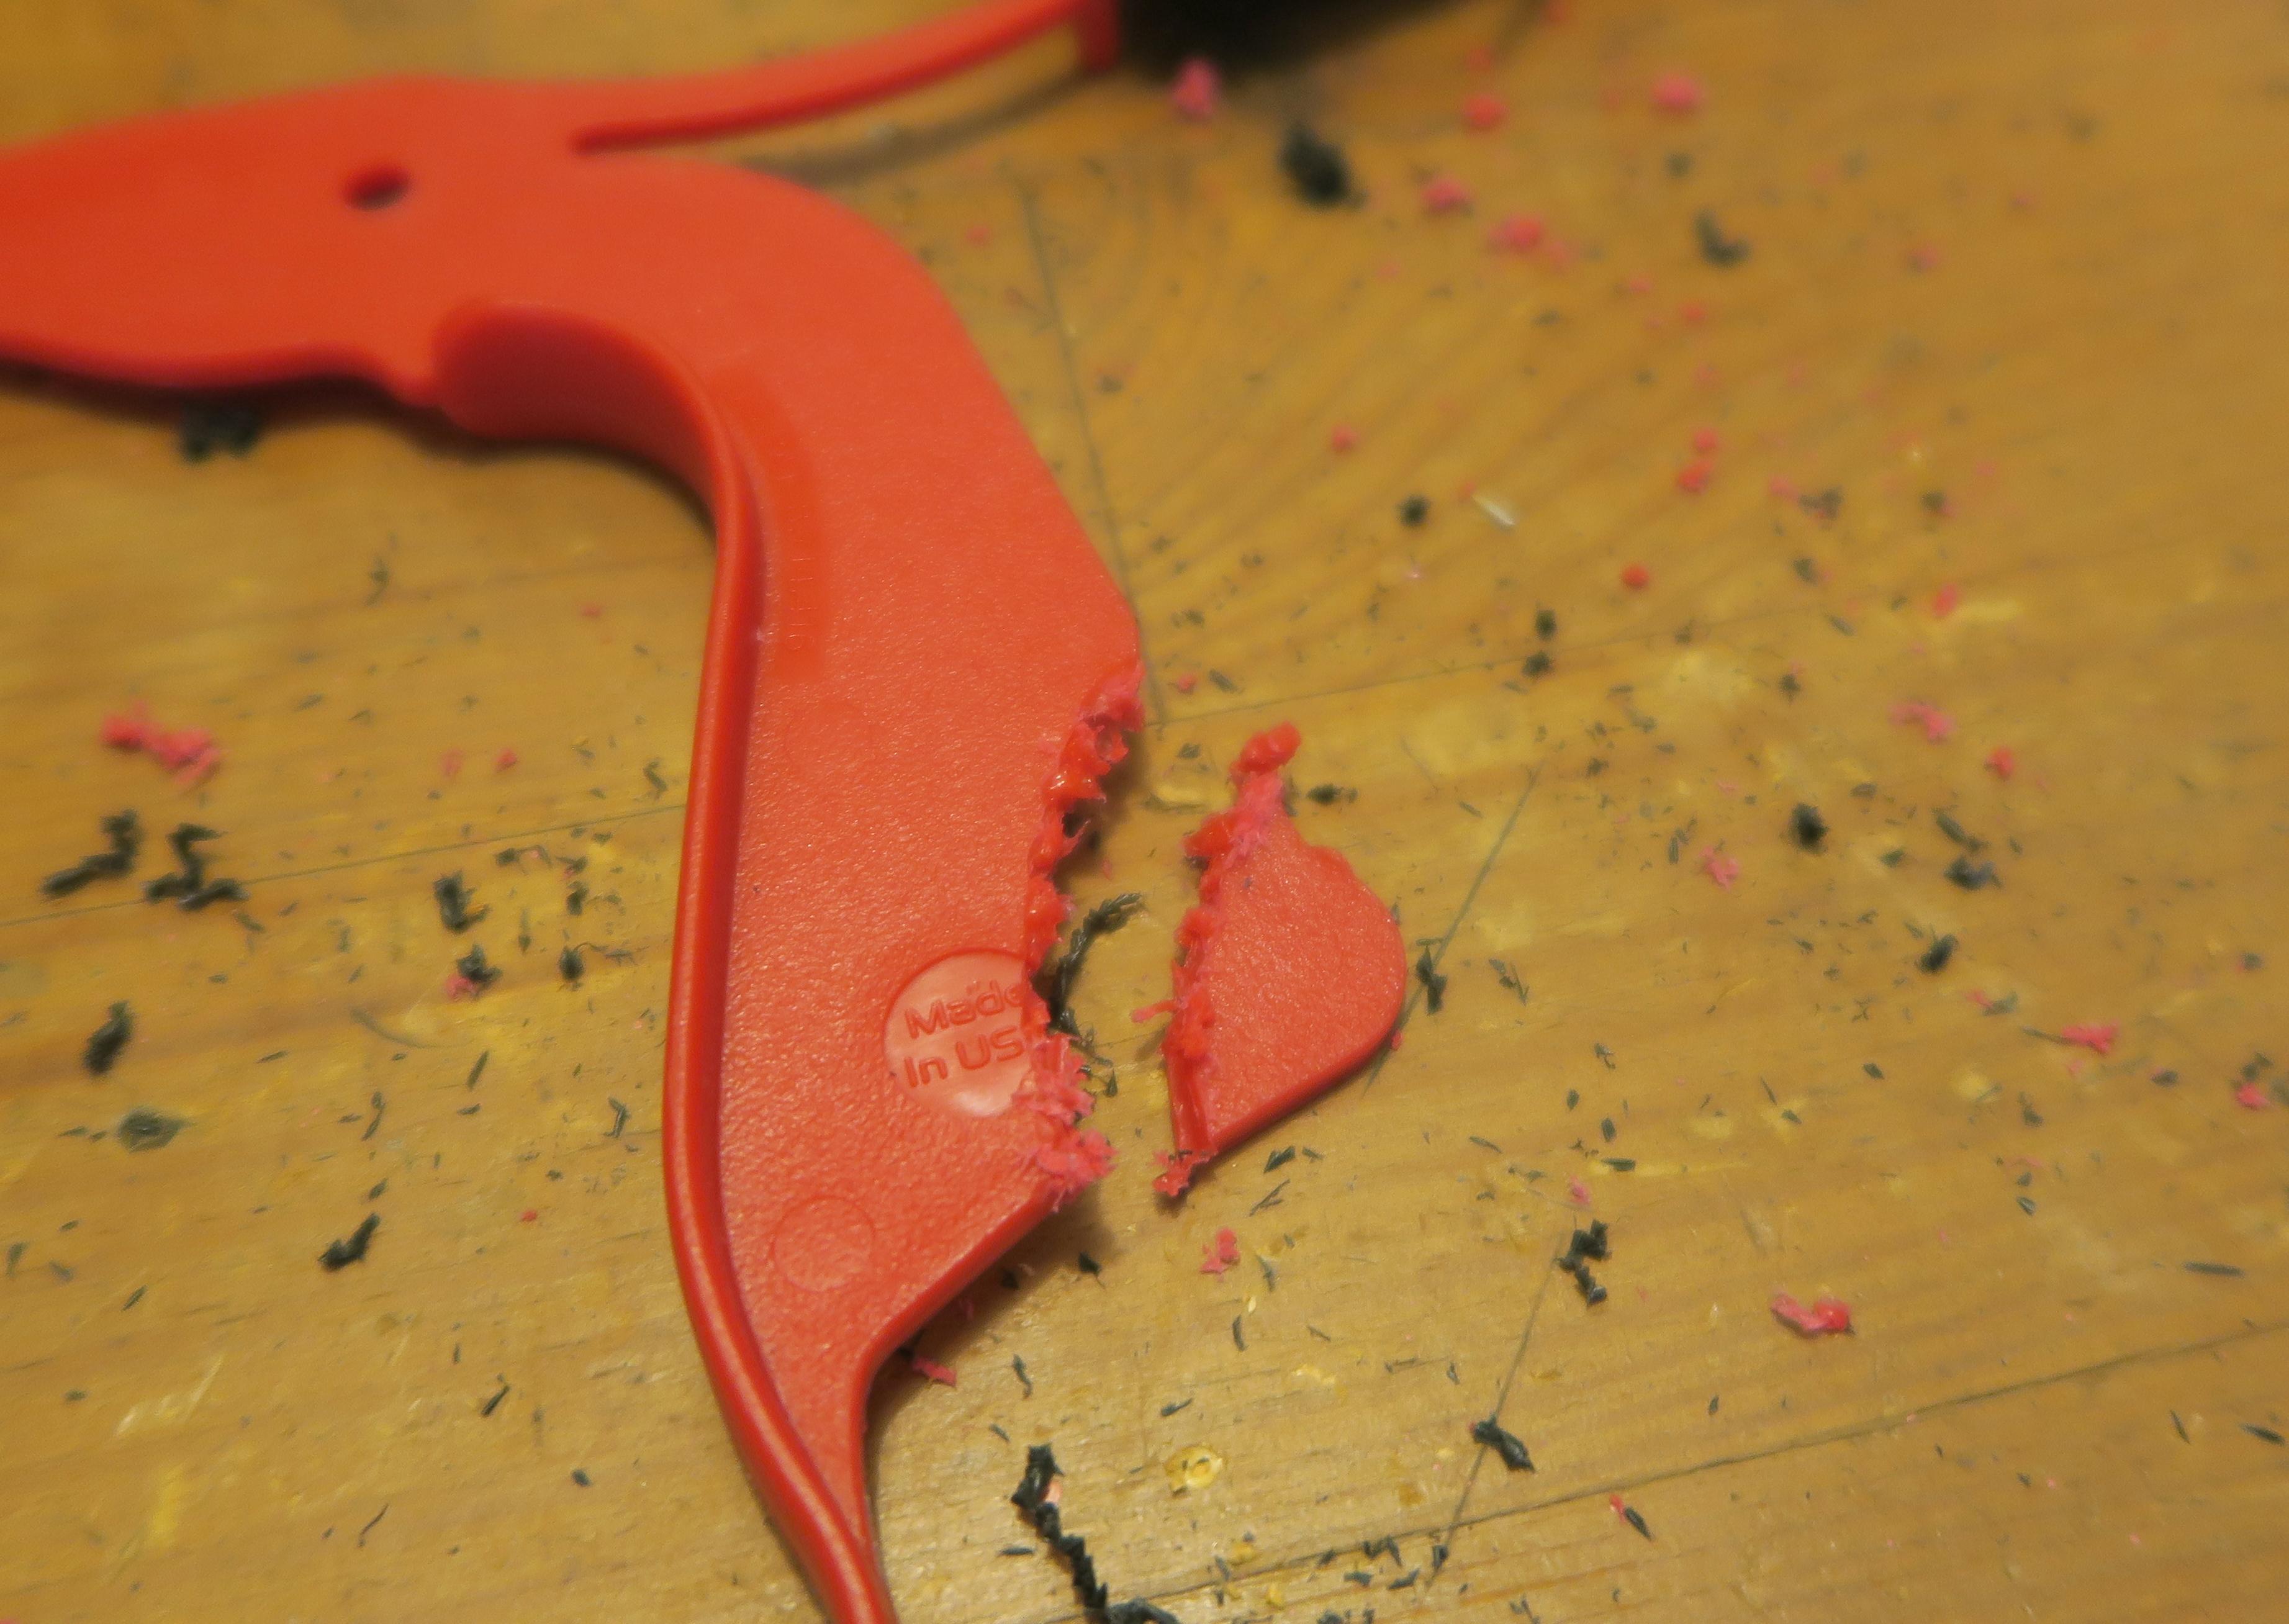 hacks_drone-spray-cut-red-part.jpg